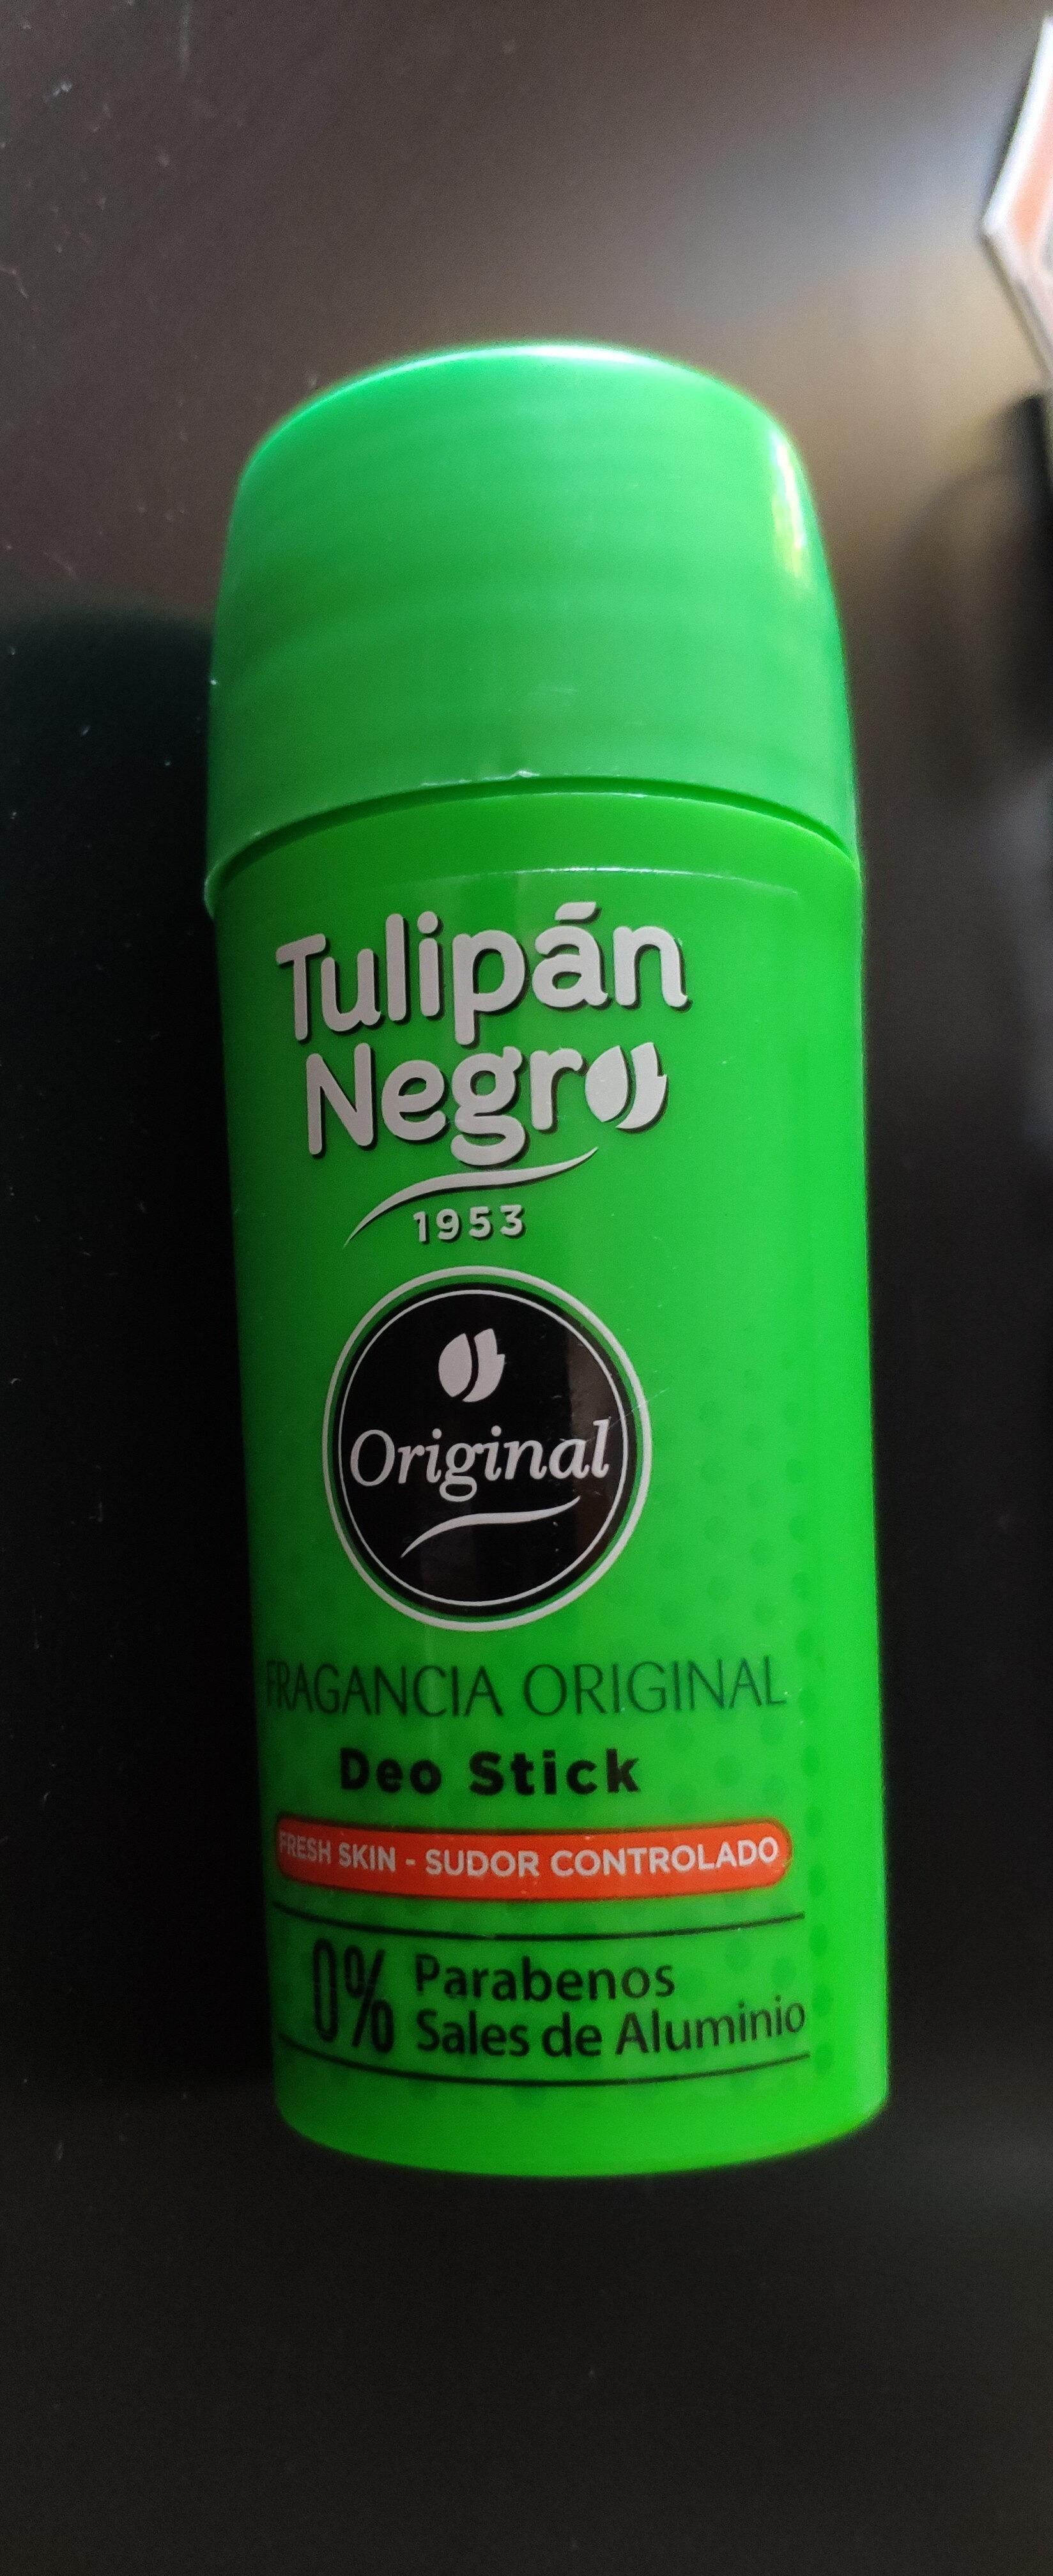 Tulipán Negro Original Deo Stick - Product - en